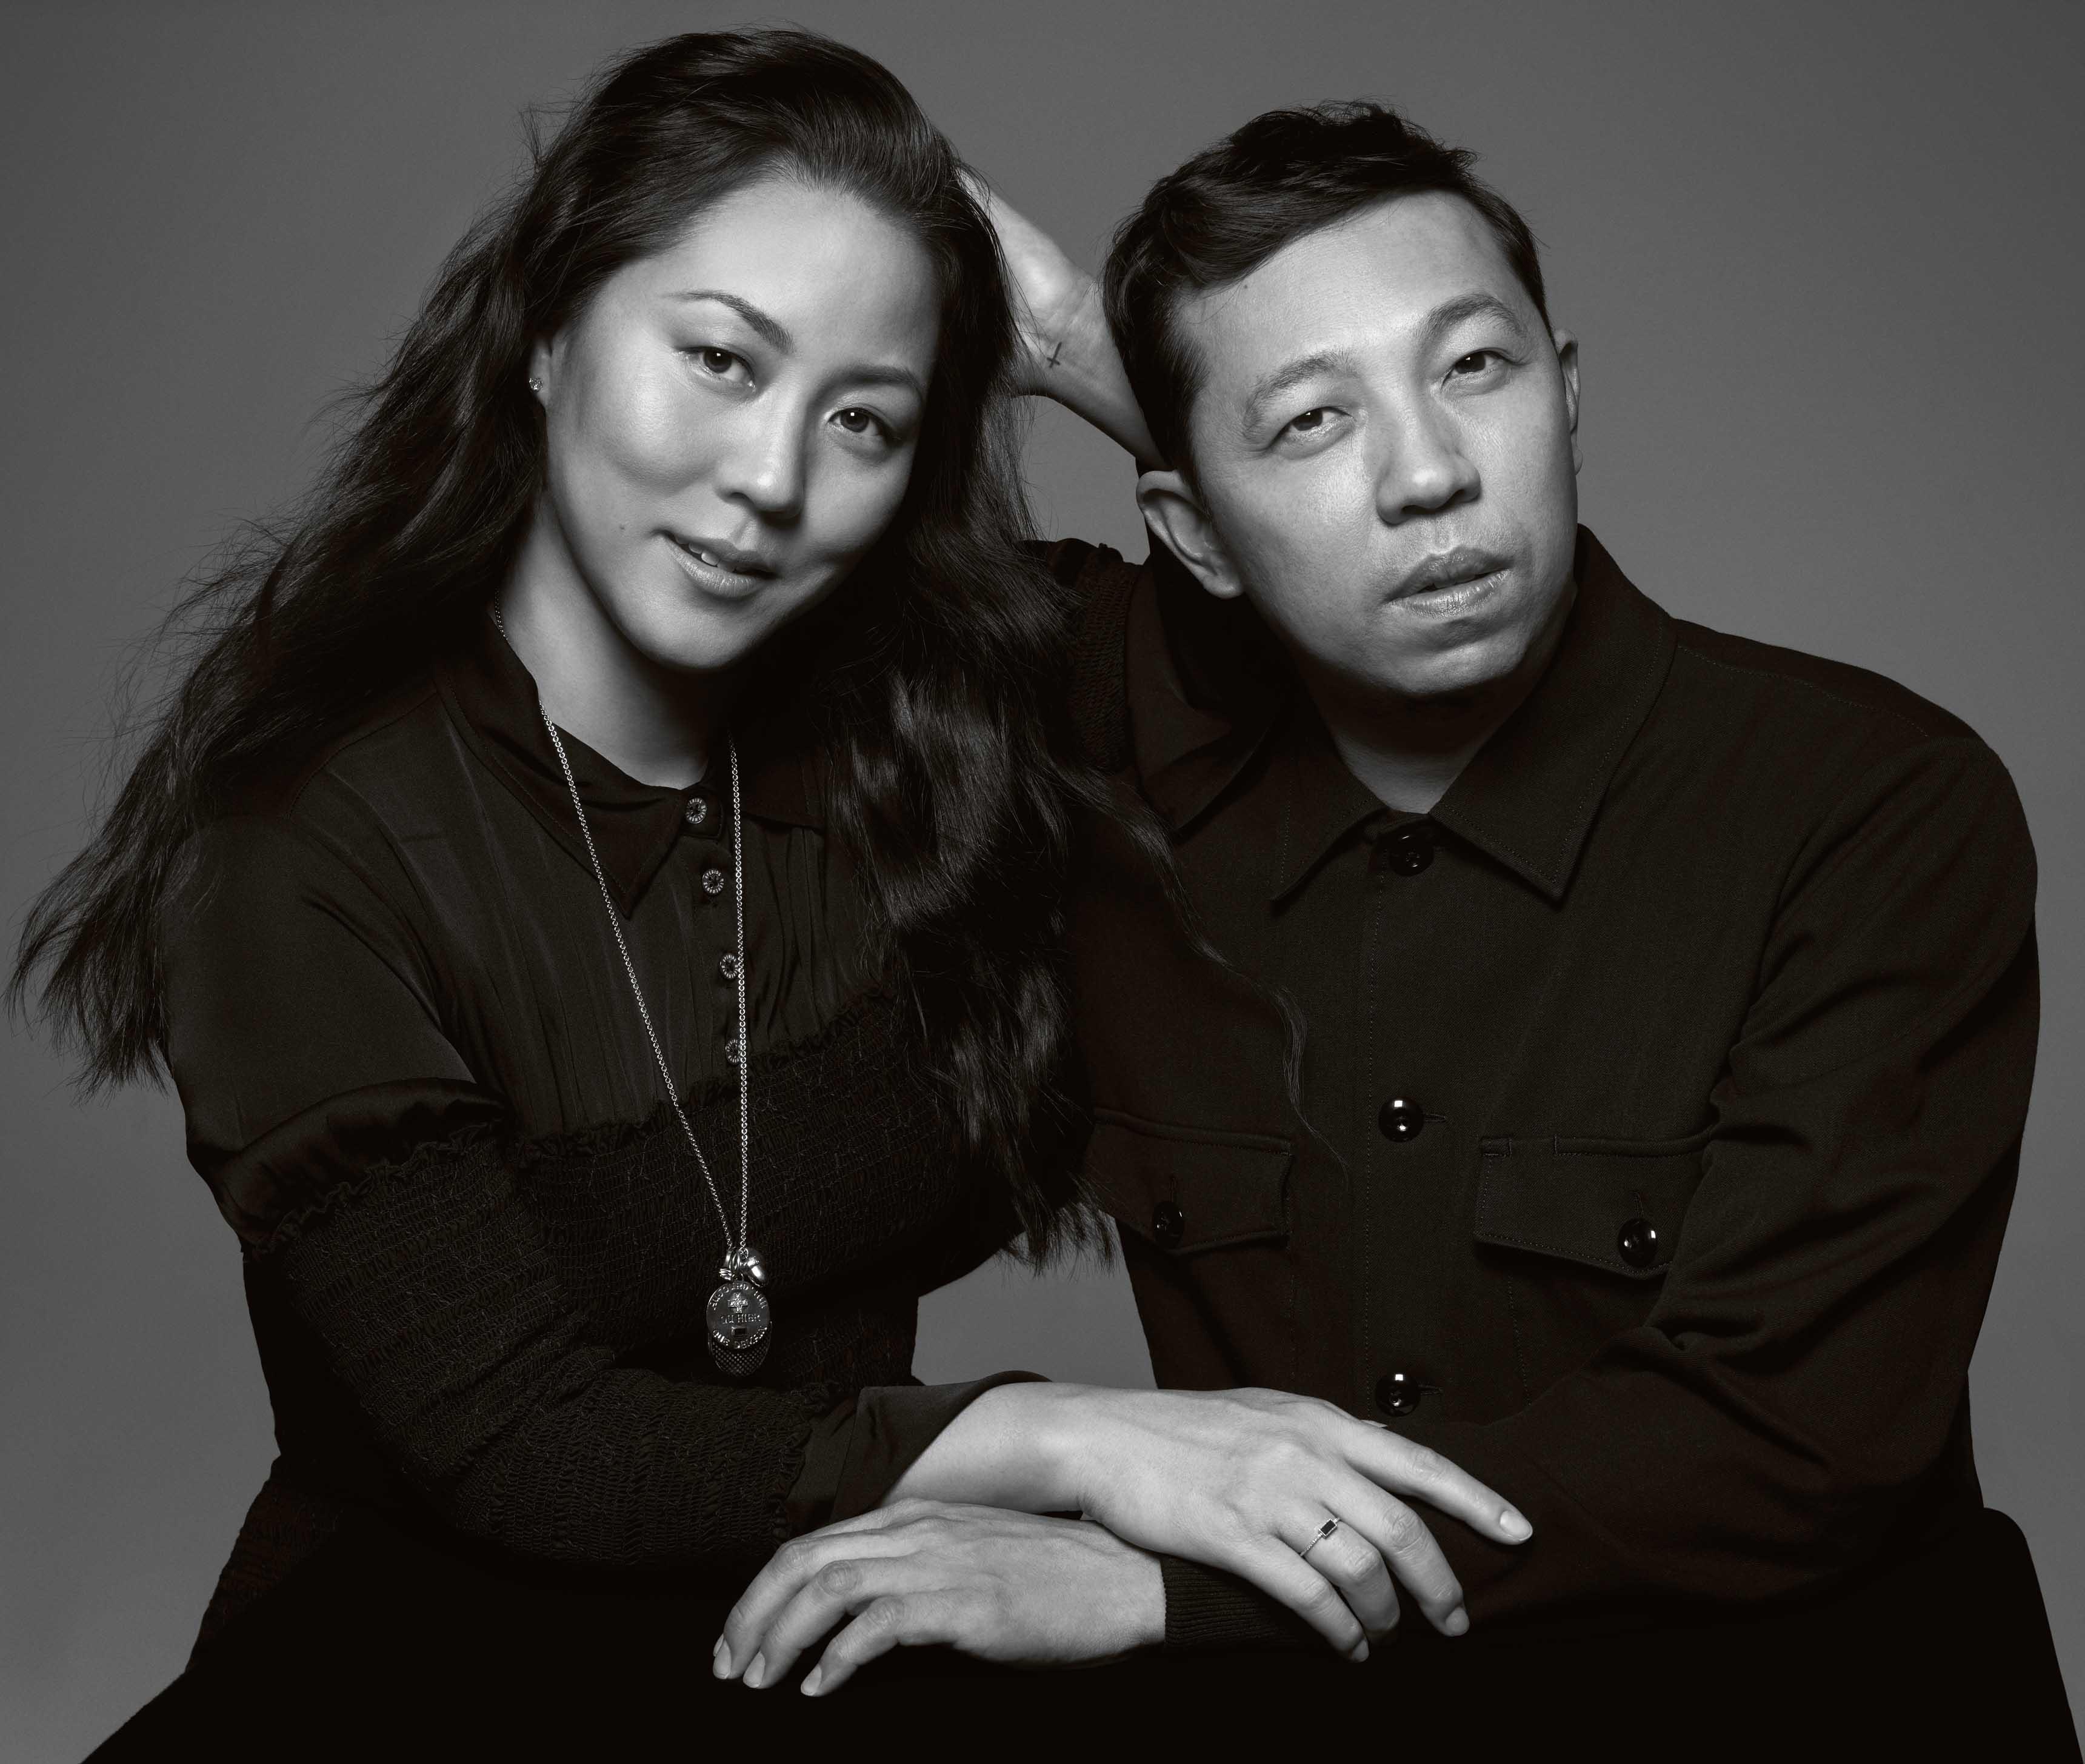 Carol Lim et Humberto Leon. Photo : Inez + Vinoodh.